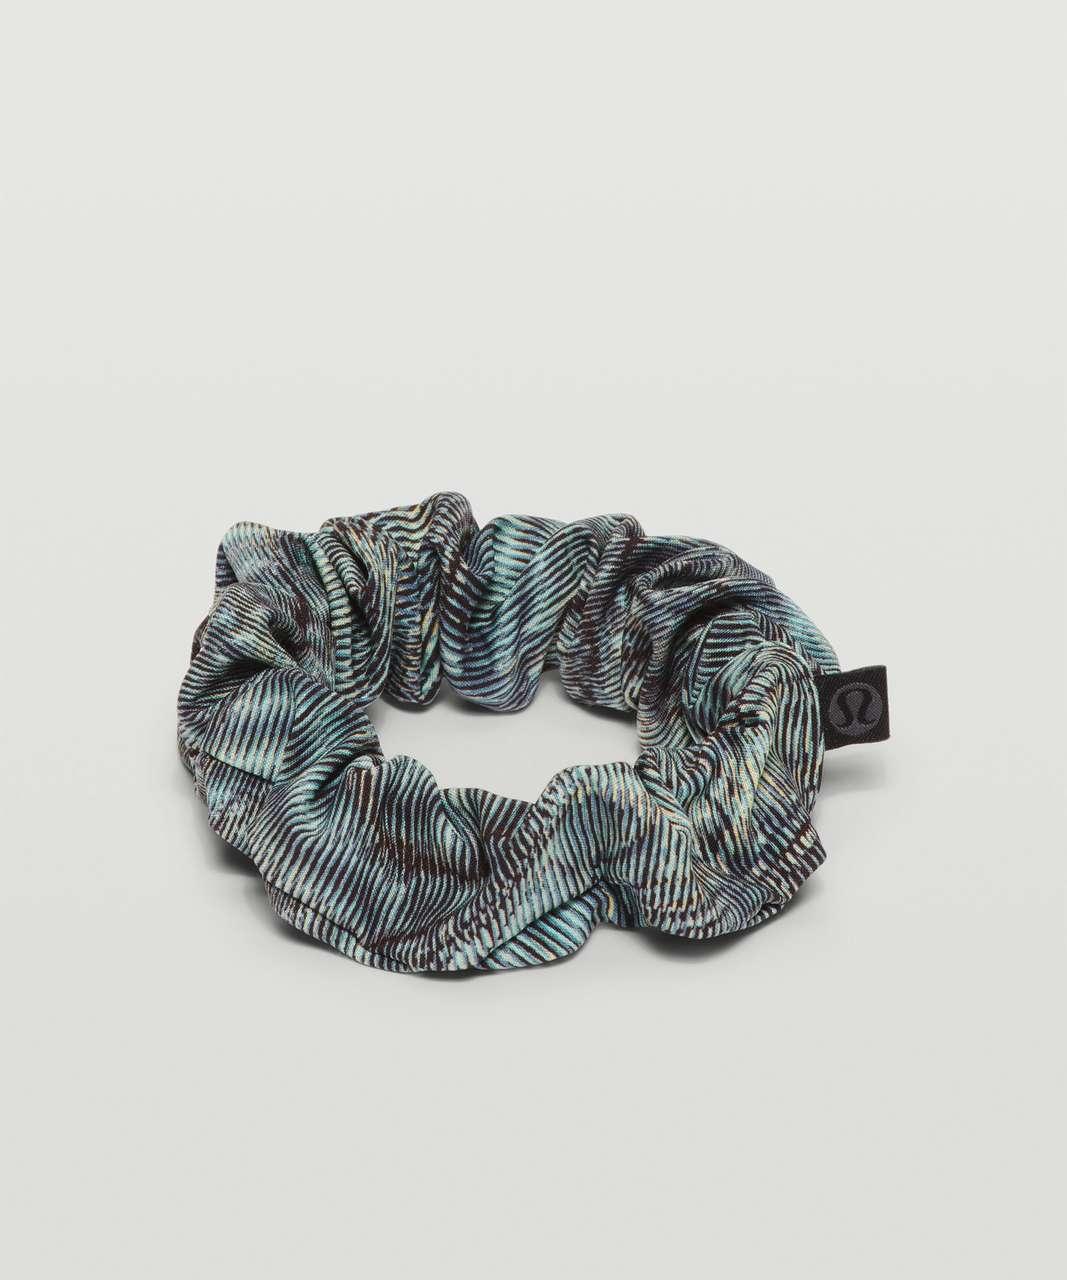 Lululemon Uplifting Scrunchie - Dimensional Icing Blue Multi